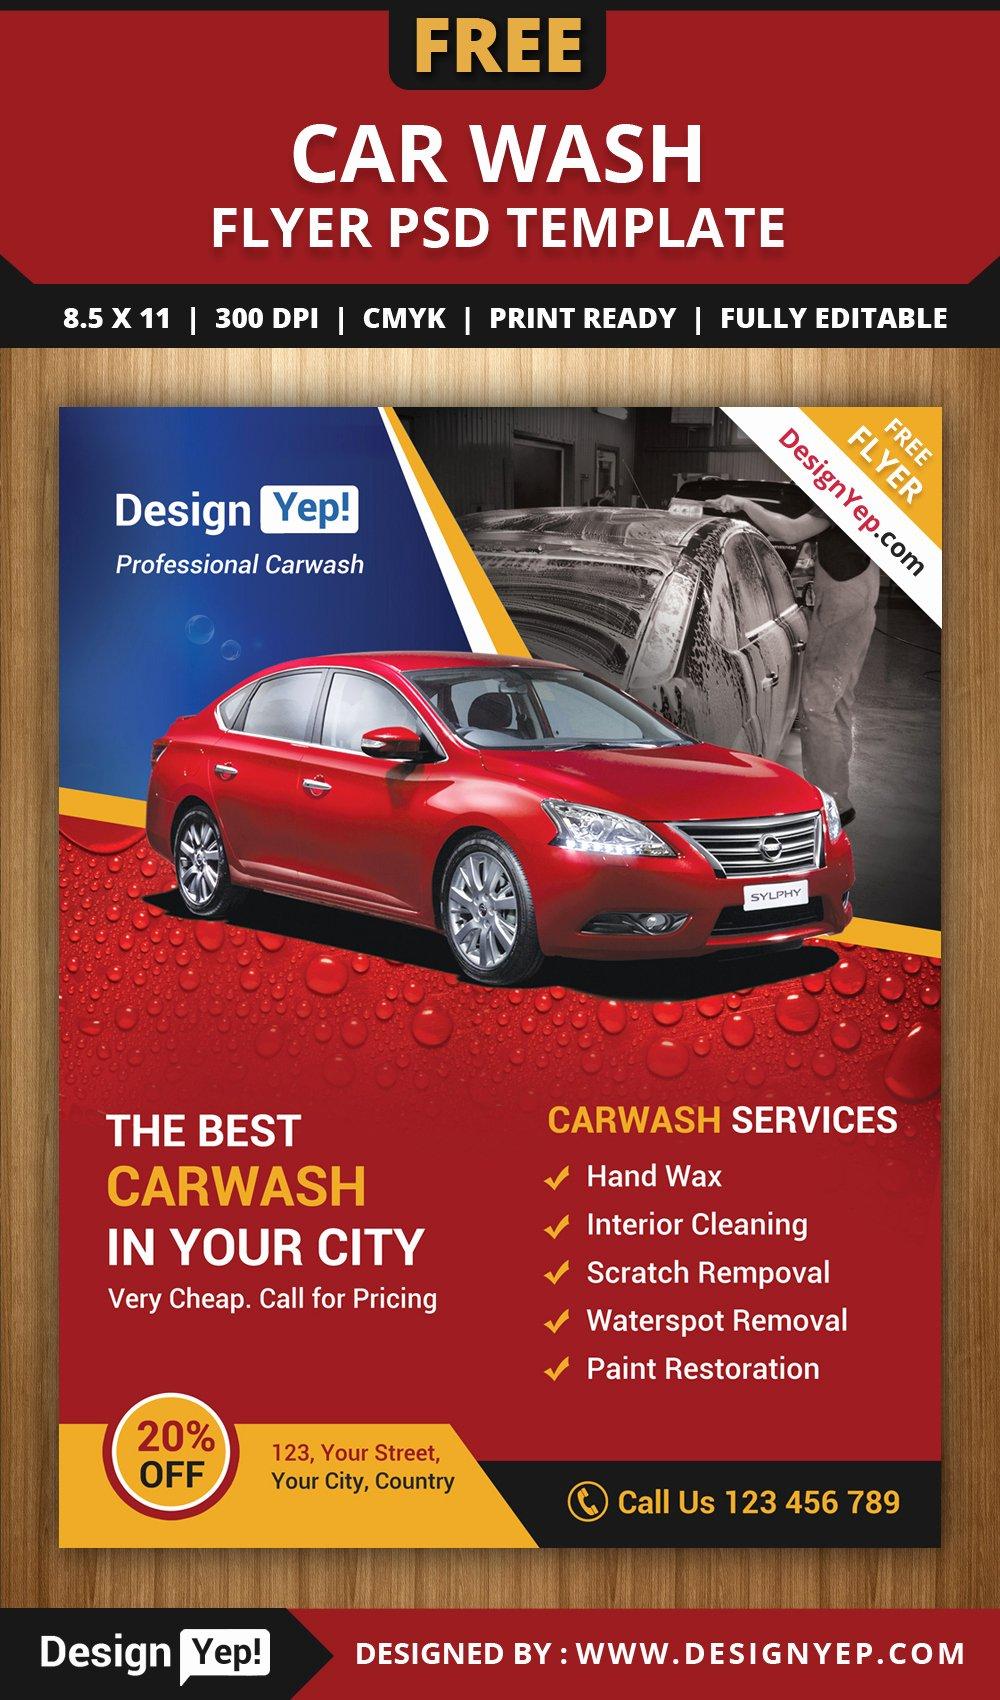 Car Wash Flyers Template New Free Car Wash Flyer Psd Template Designyep